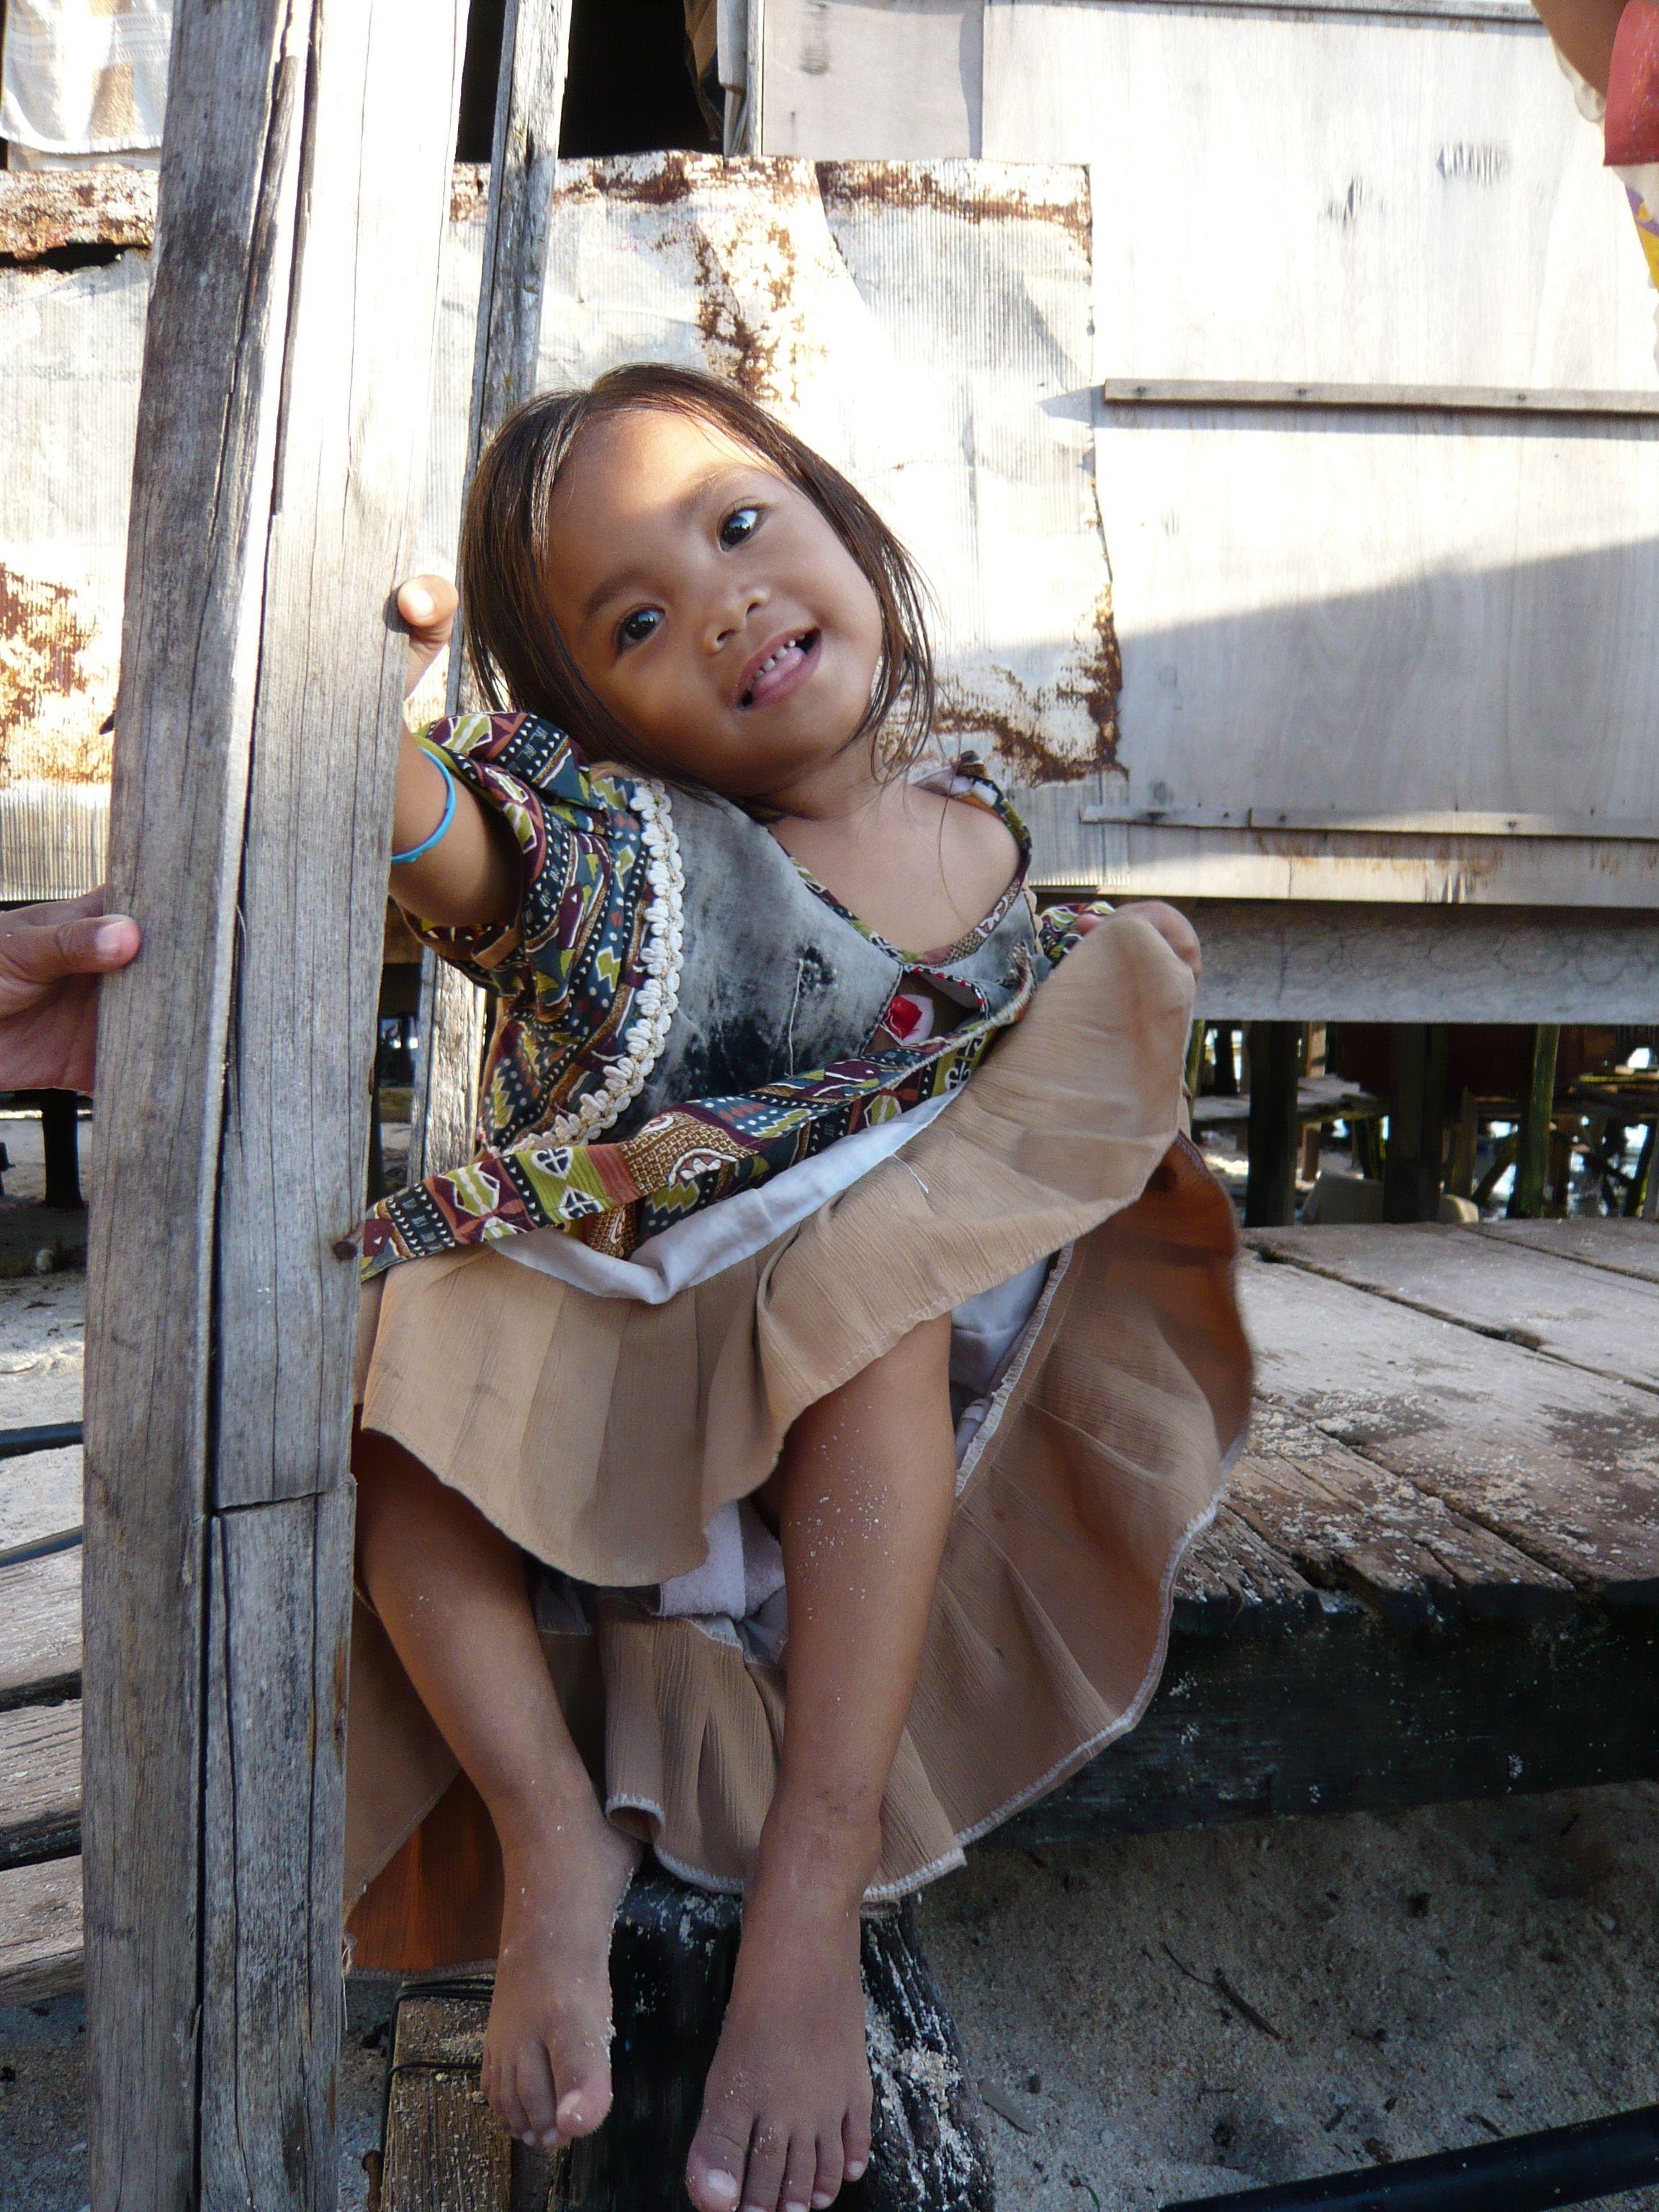 Very Sweet Girl Mabul Borneo Borneo Sweet Girls Young Children Southeast Asia